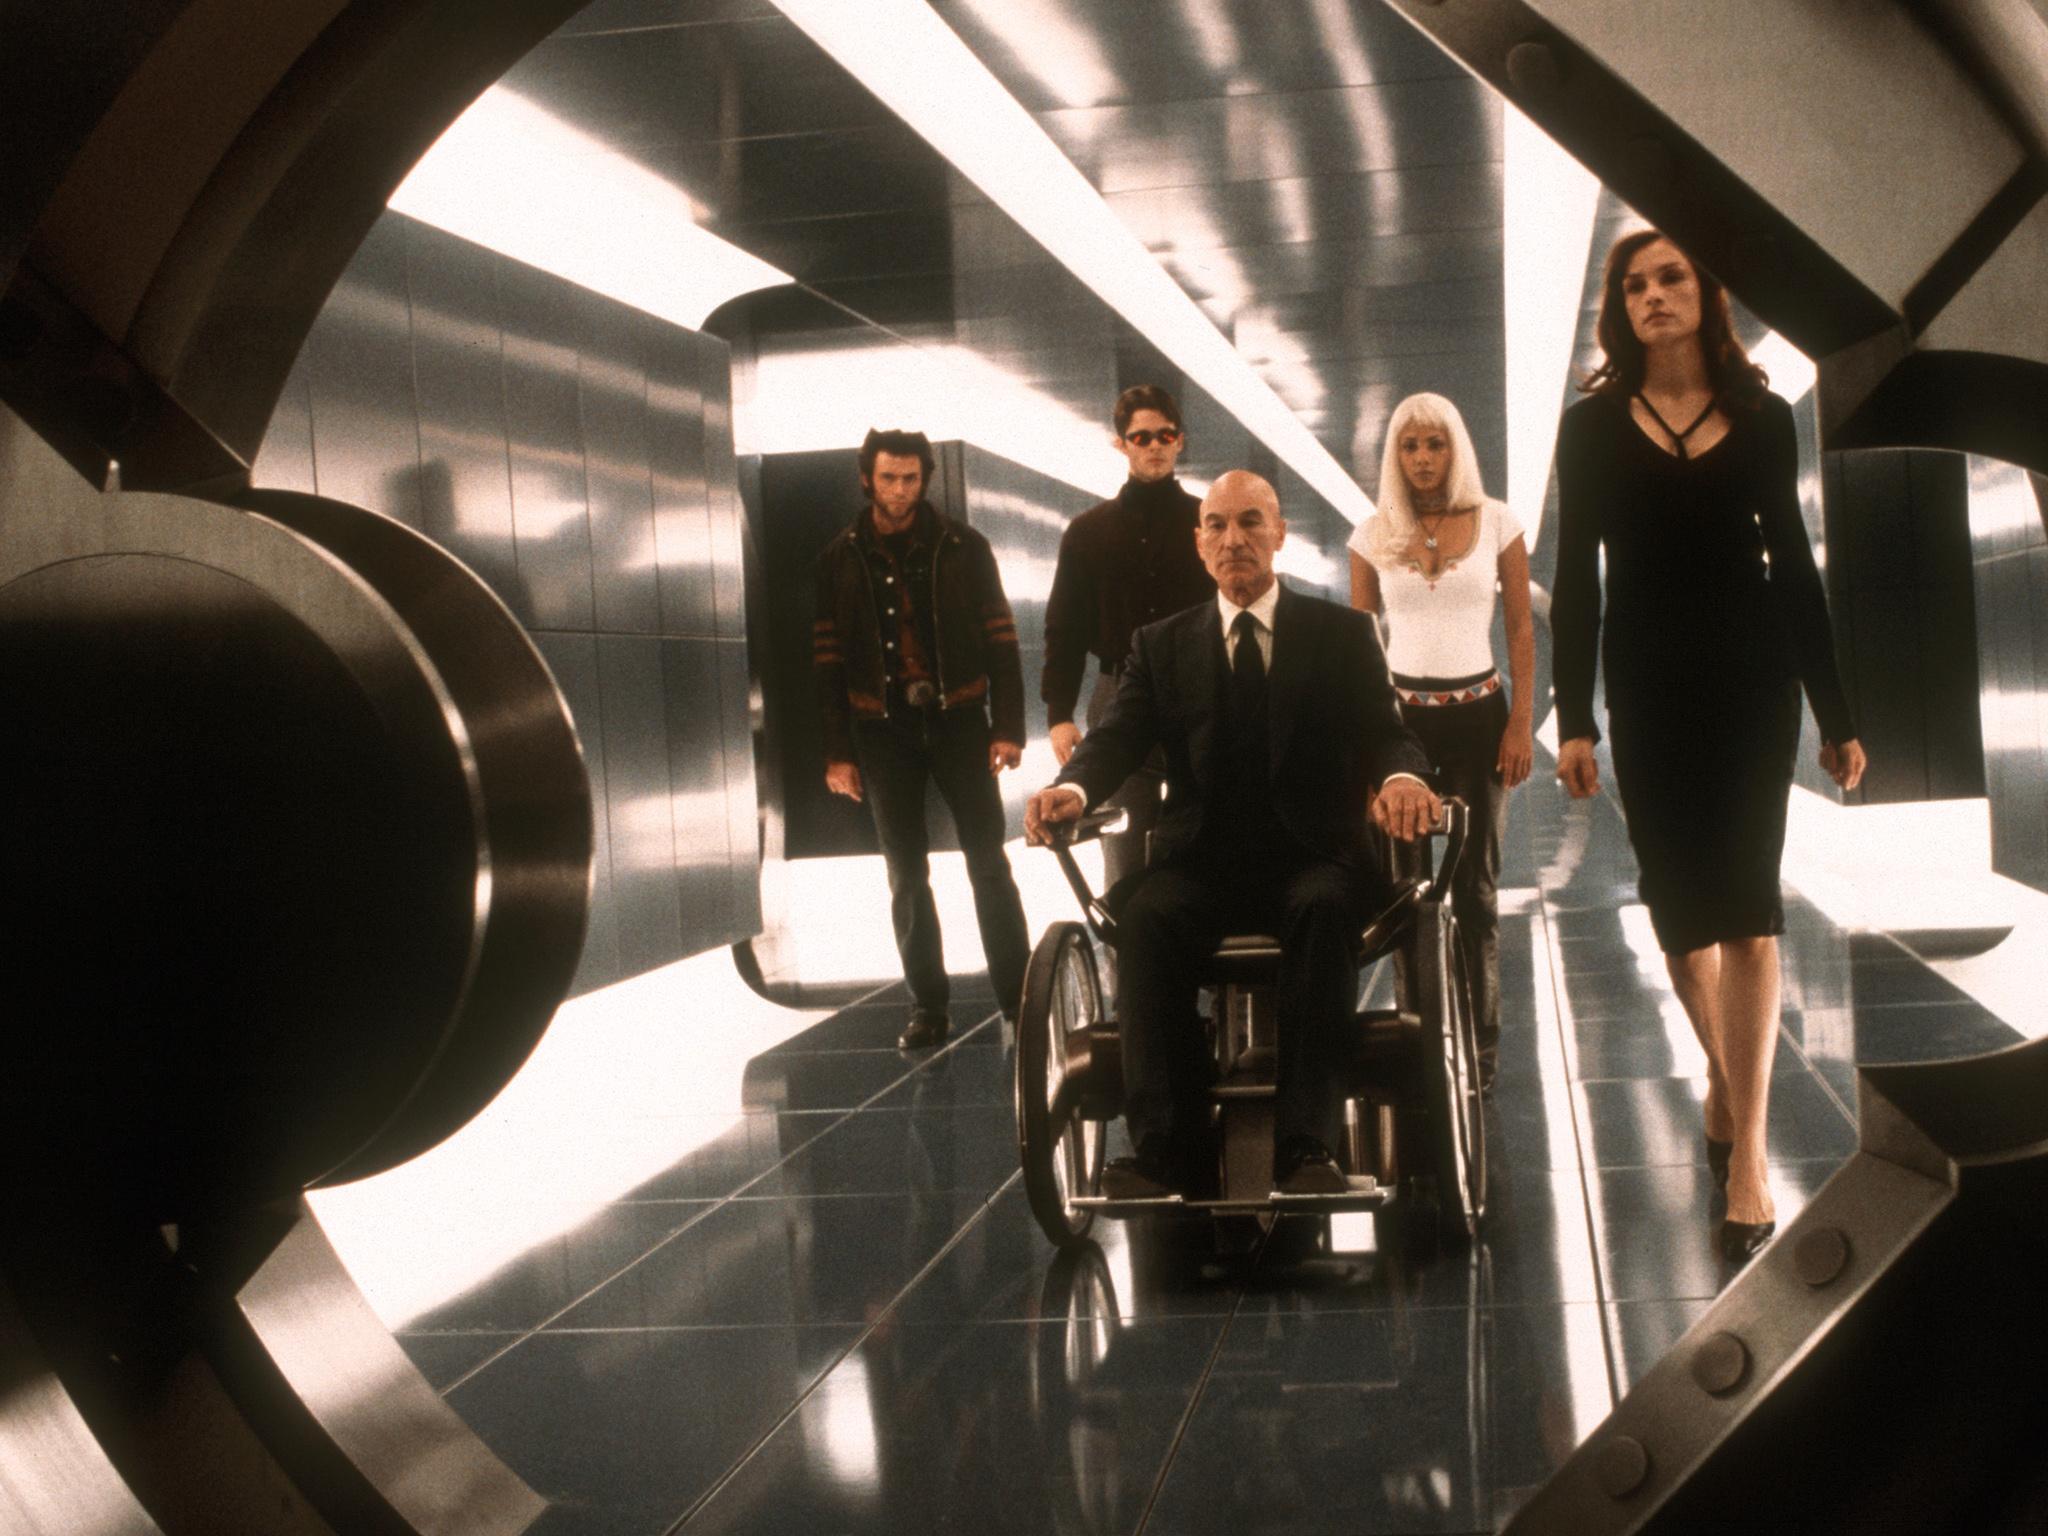 X-Men, superhero movies